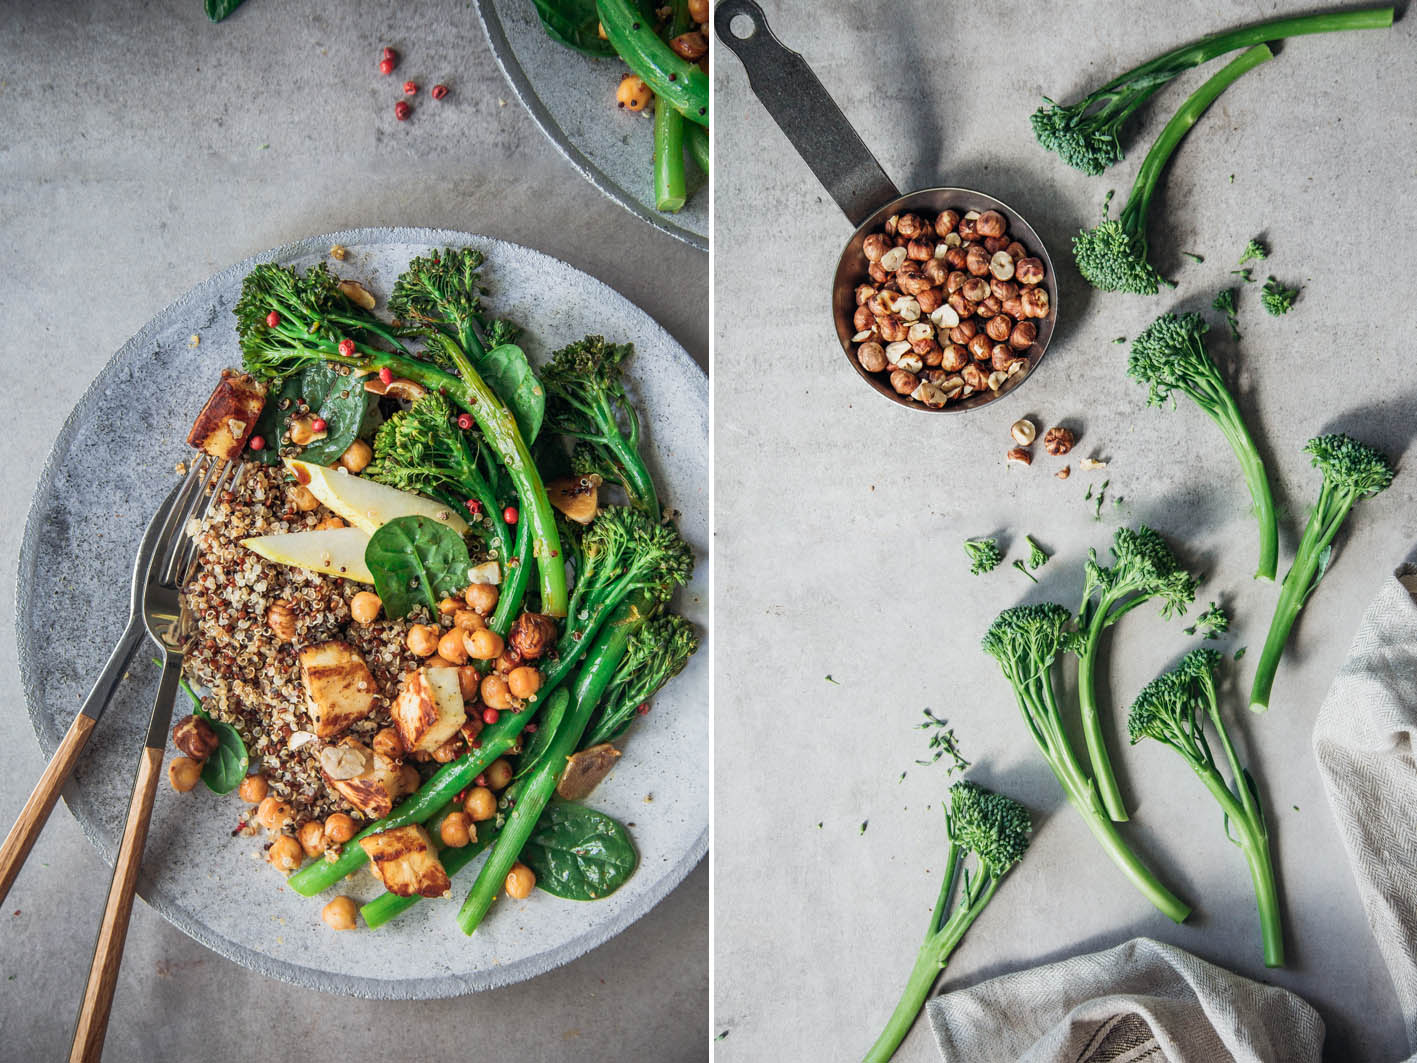 Rezept mit Bimi Broccolini